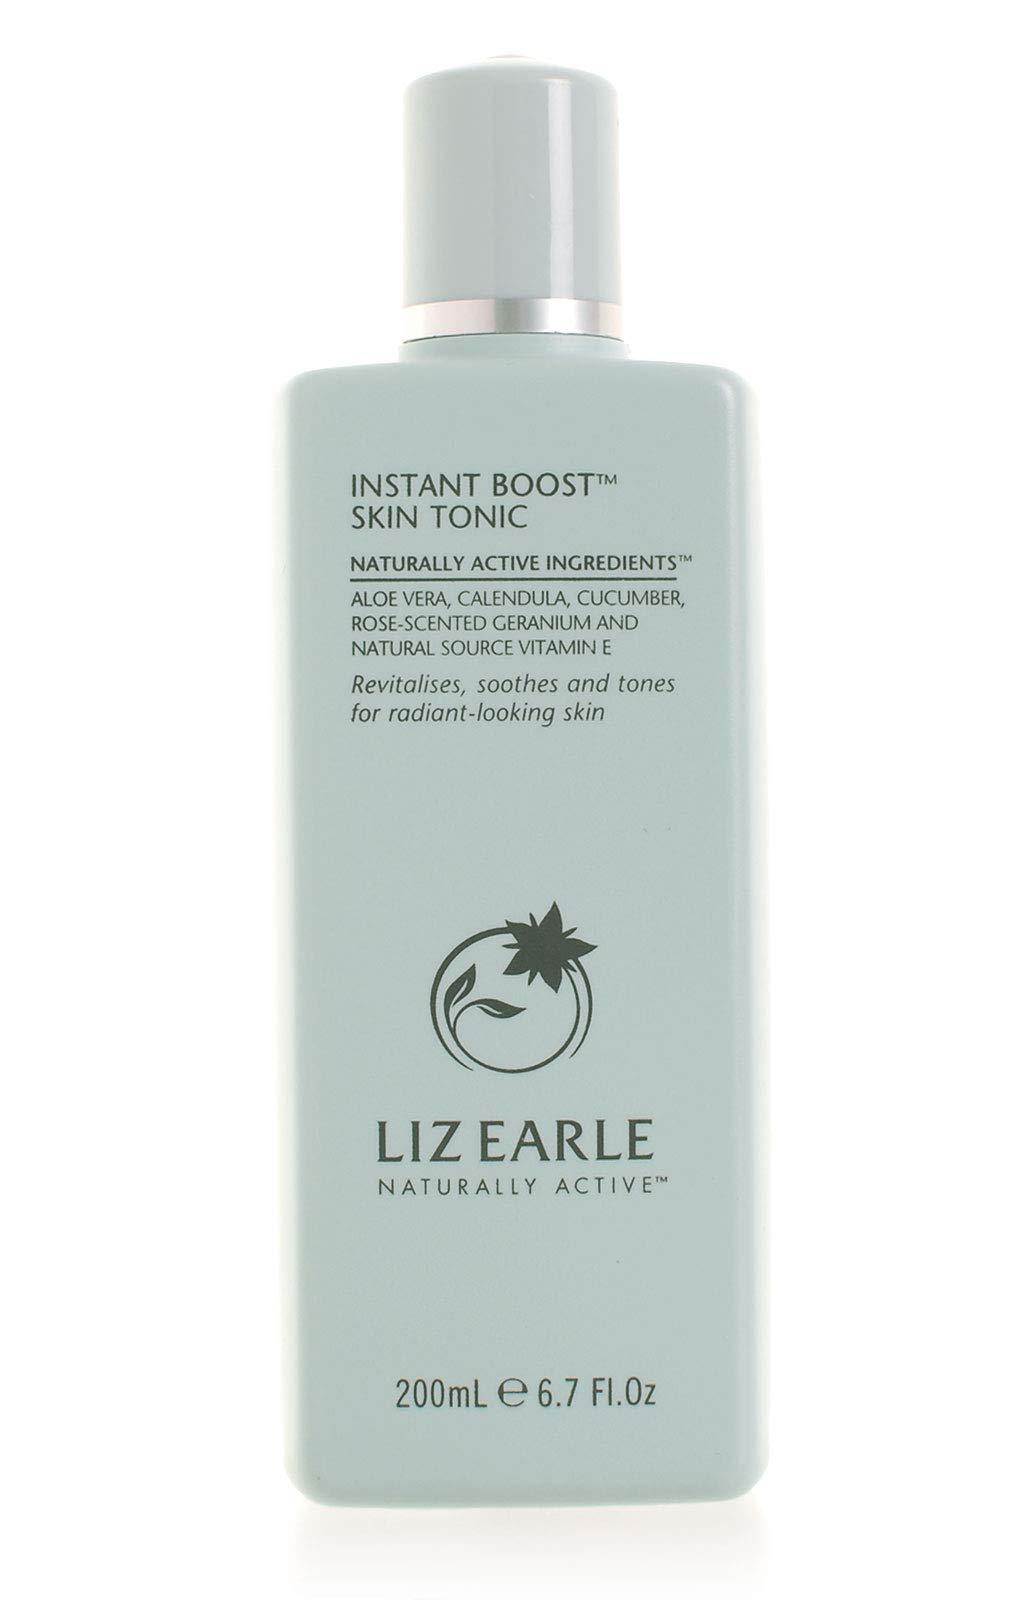 Liz Earle Instant Boost Skin Tonic 200ml